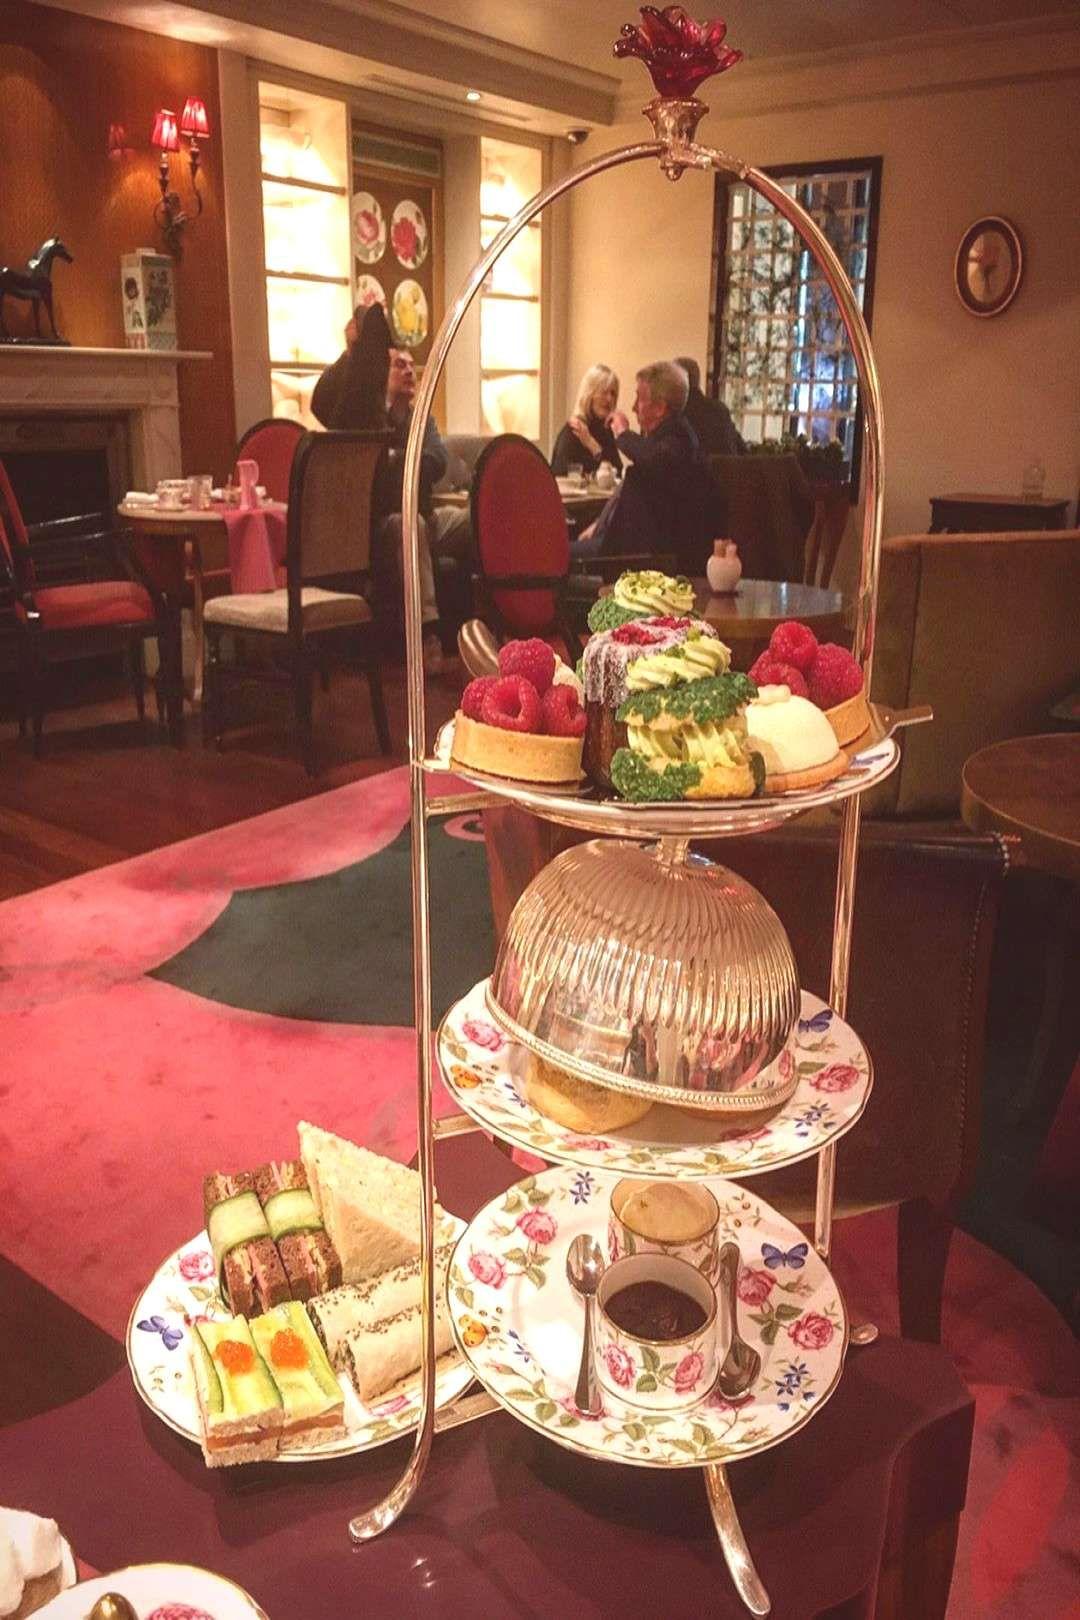 #sittingtableindoor #afternoontea #sandwiche #teatime #people #time #food #tea #and Tea time ️ . . . . . . . #AfternoonTea #Tea #TeaTime #SandwicheYou can find Sandwiches and more on our website.Tea time ️ . . . . . . . #AfternoonT...